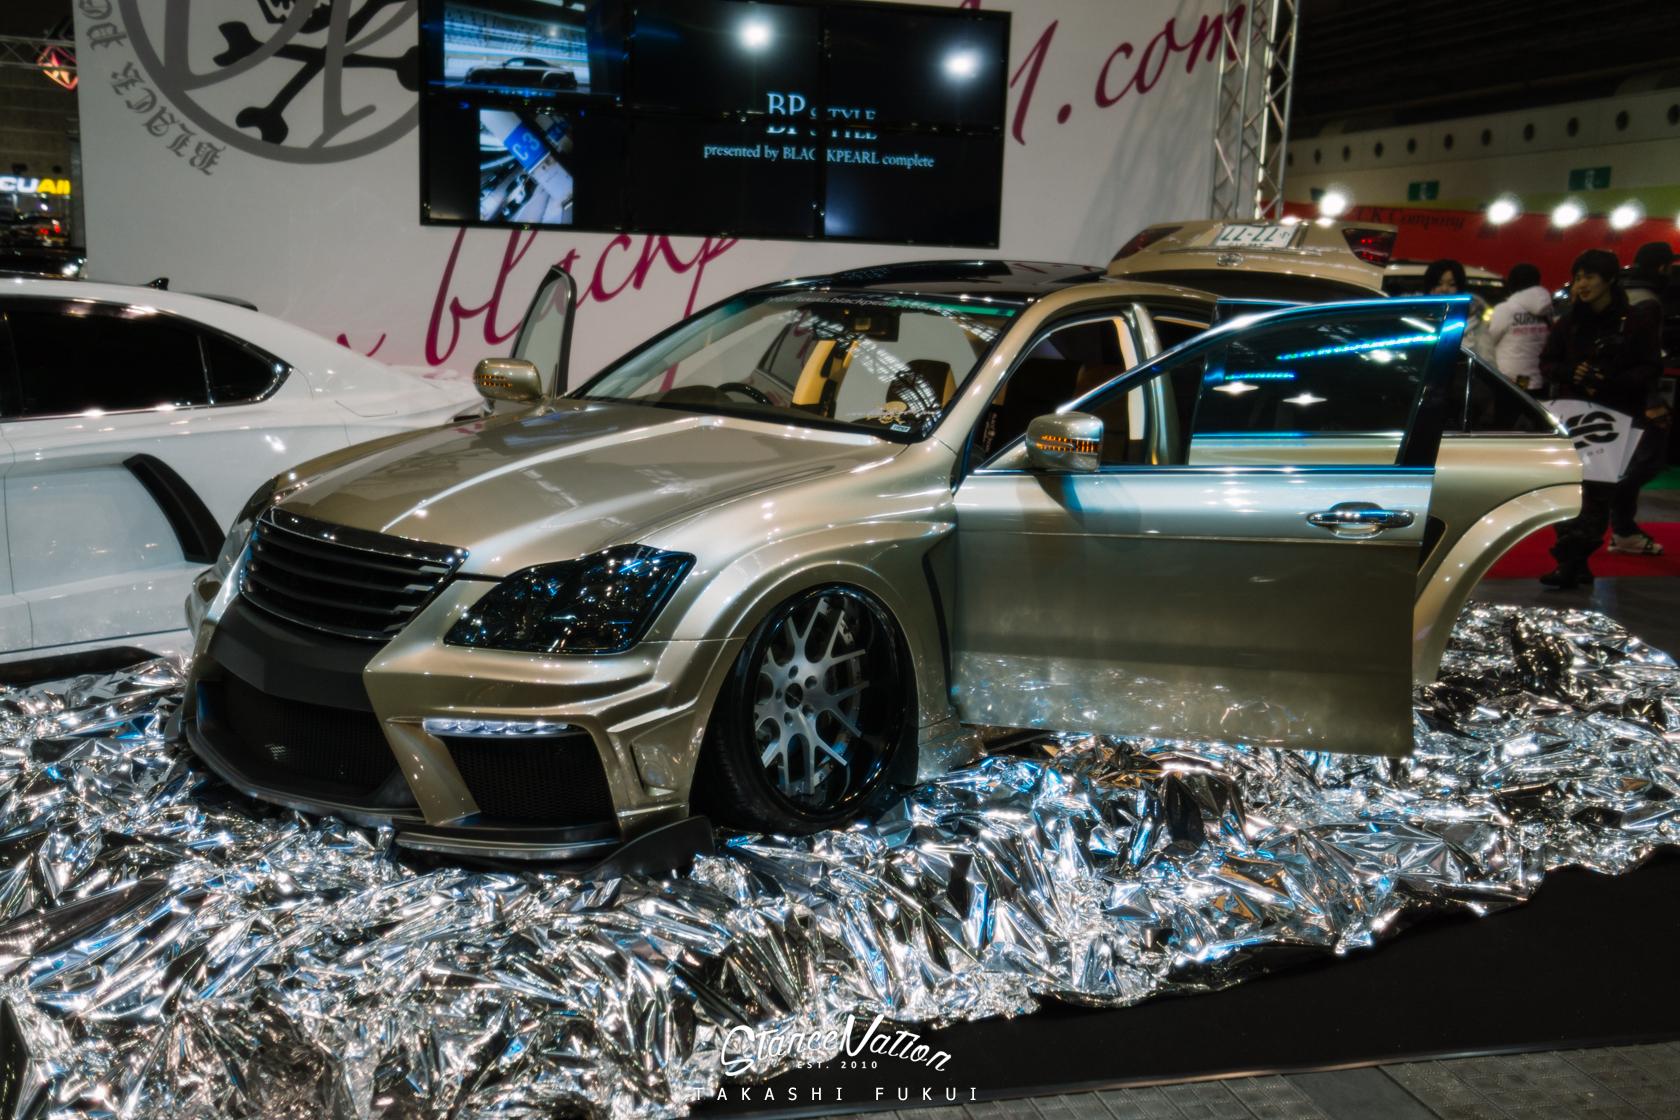 osaka auto messe 2014 photo coverage-123